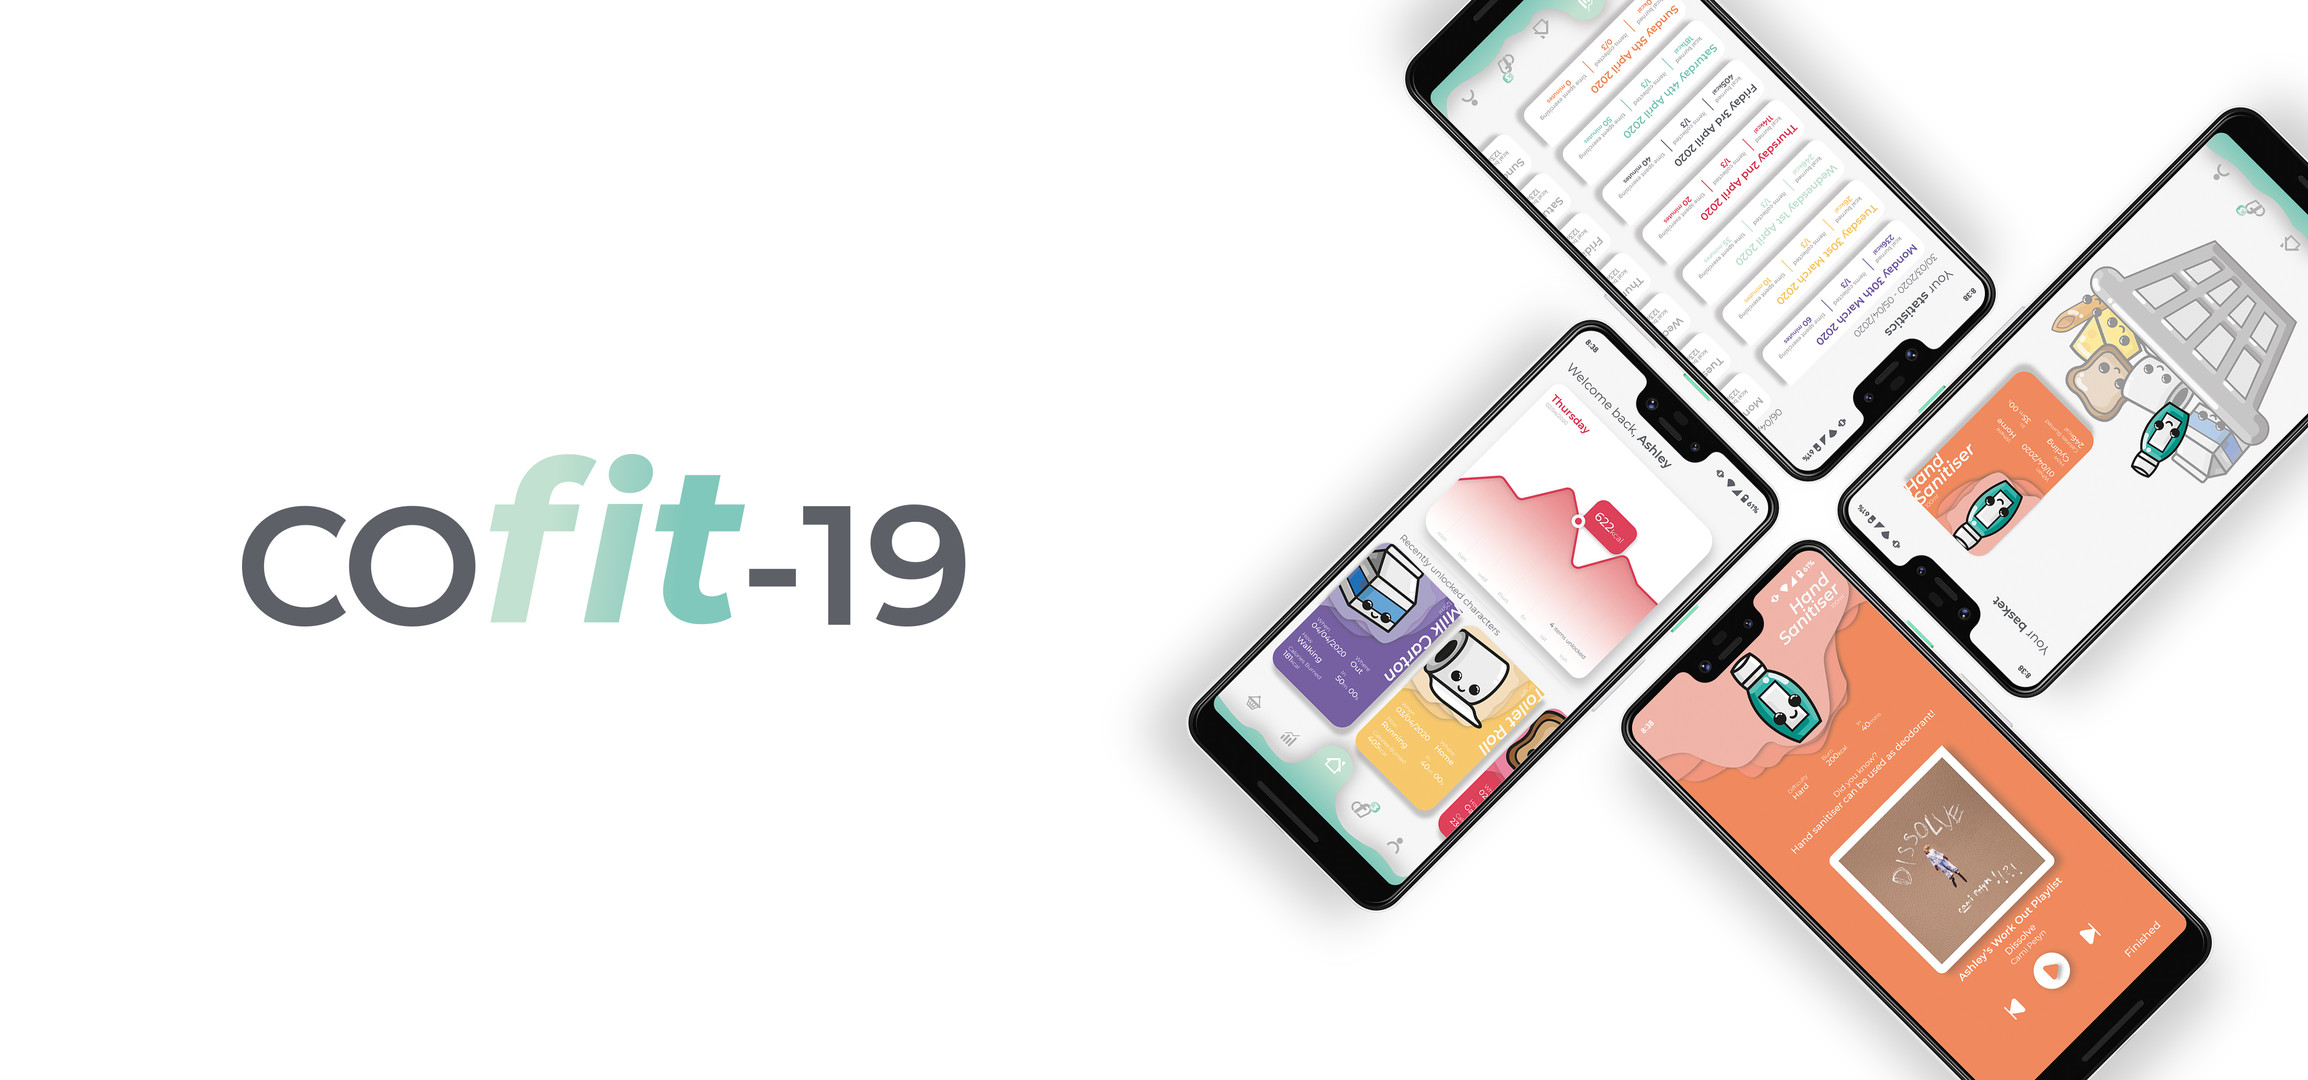 Cofit-19